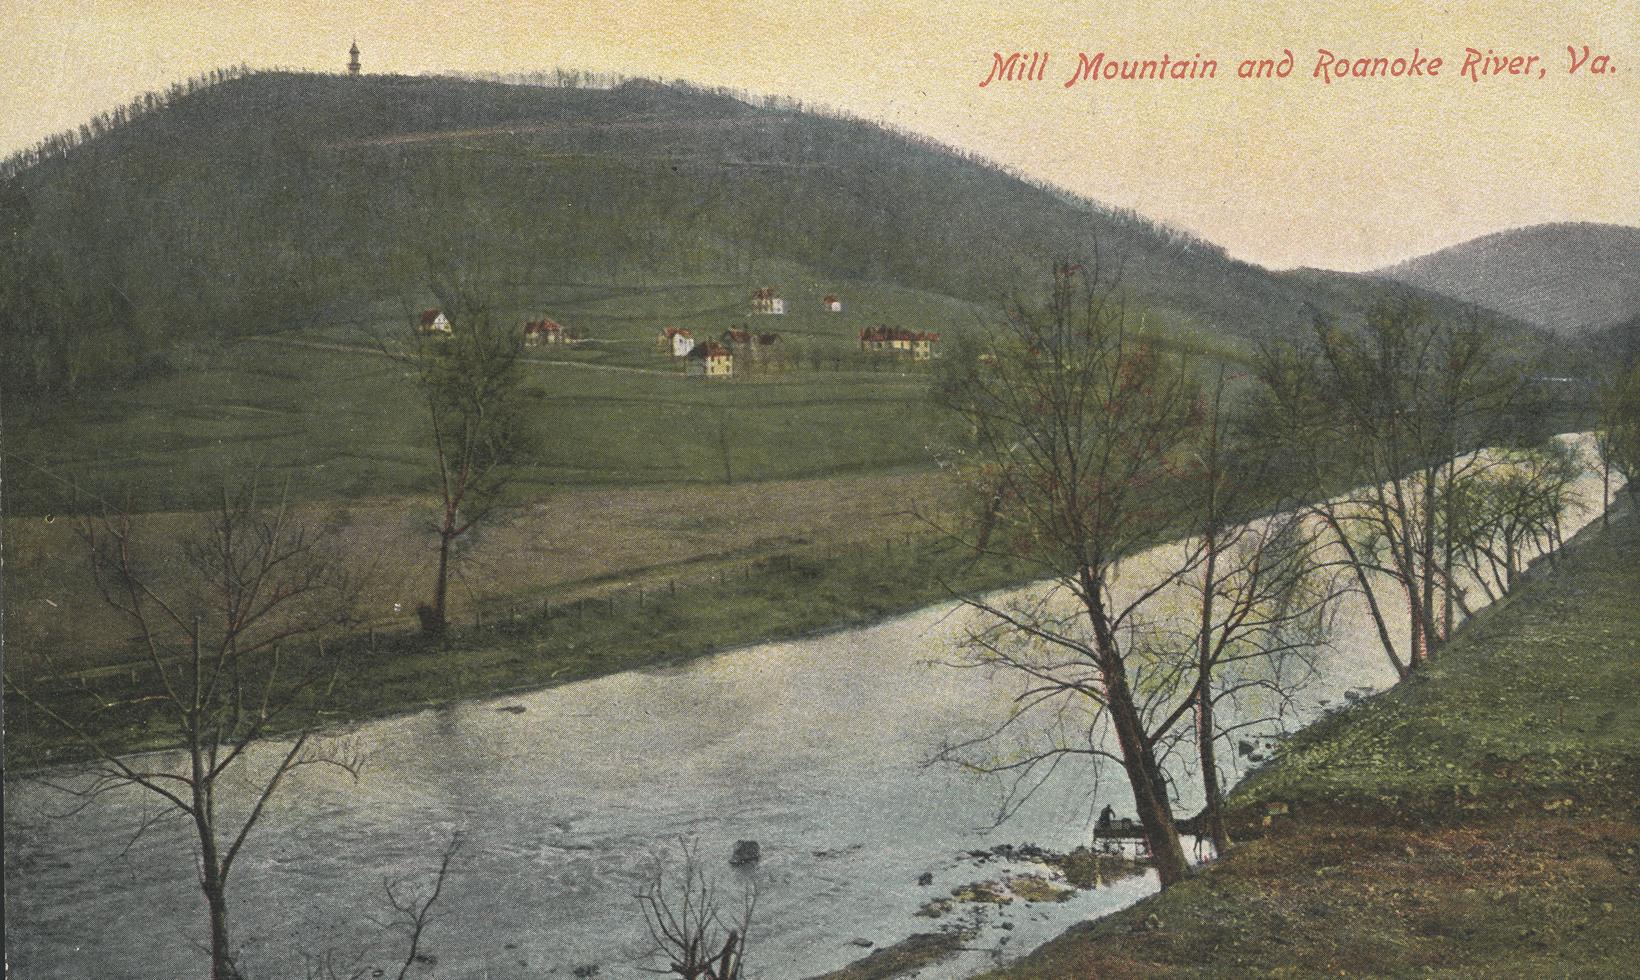 PC 119.1 Mill Mountain.jpg